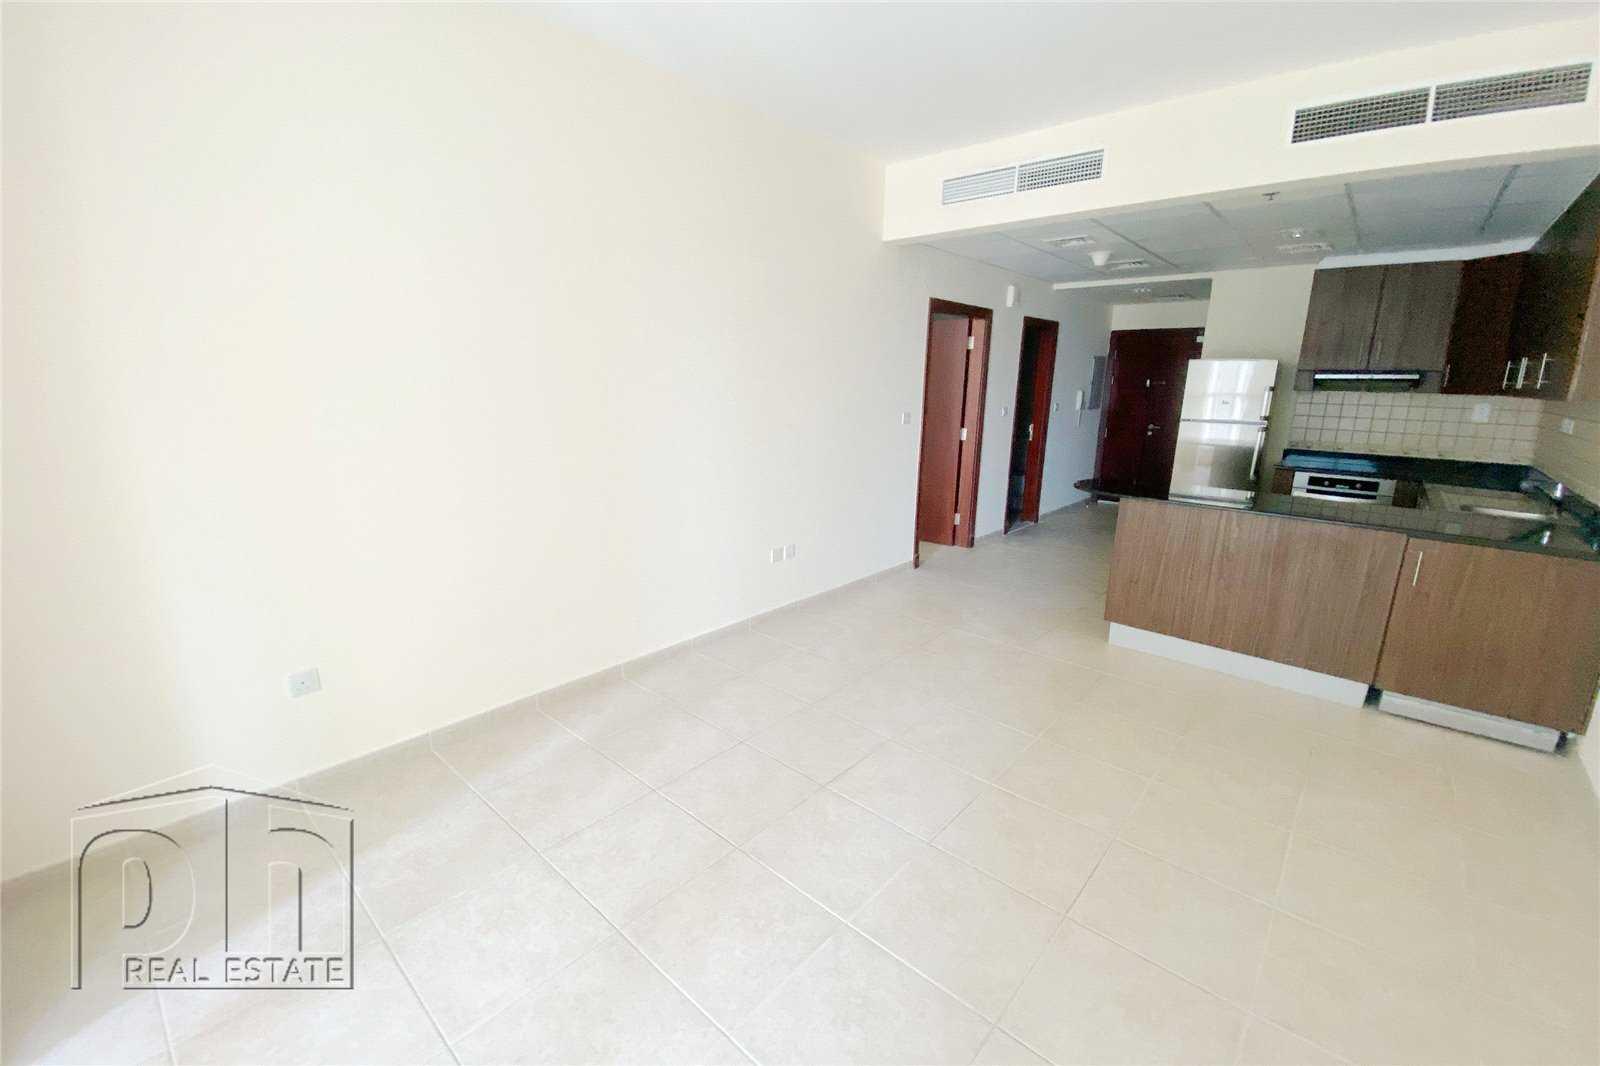 1 Bedroom | Prime Location | High Floor